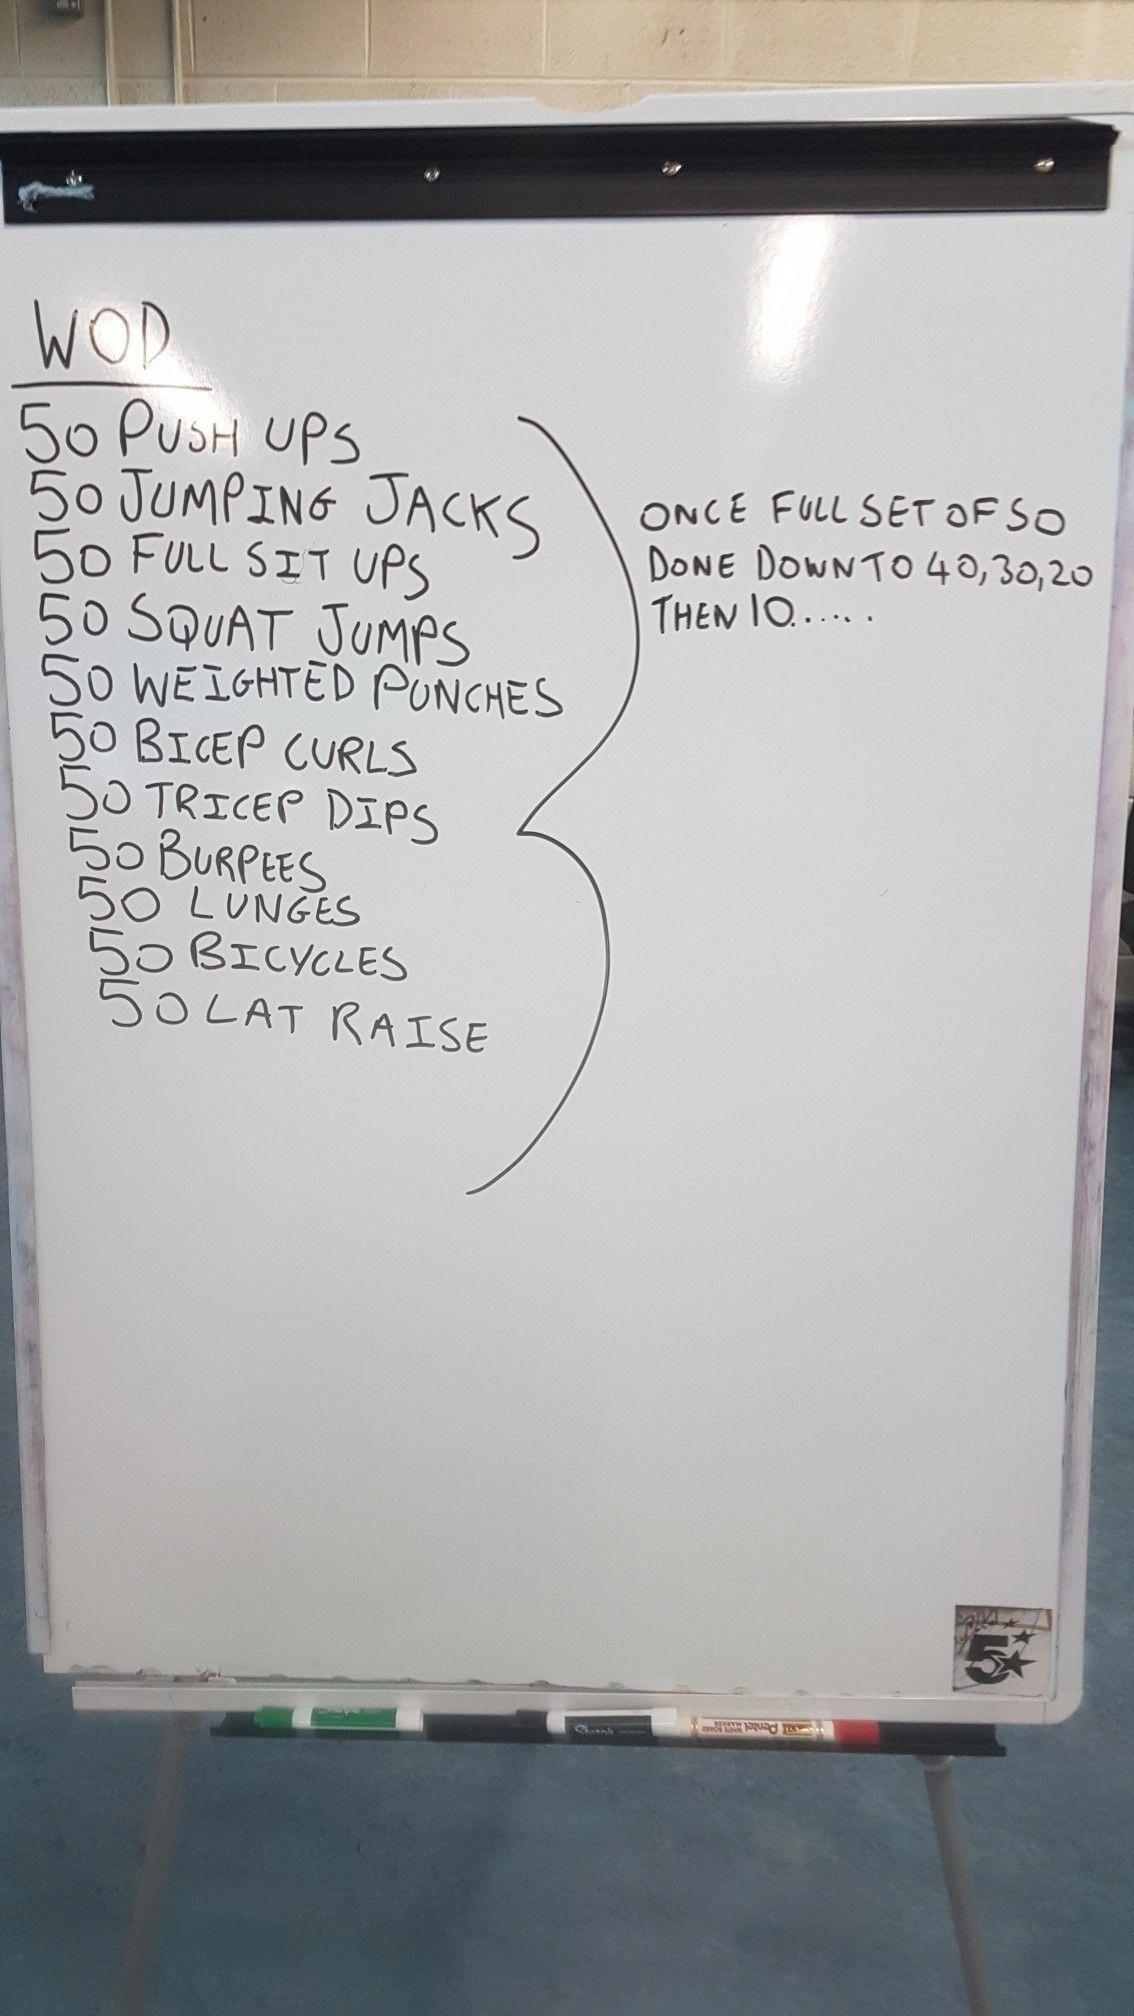 Fitness4less Bentonville Fitnesscheap Id 1257257054 Crossfit Bodyweight Workout Hard Workout Fun Workouts